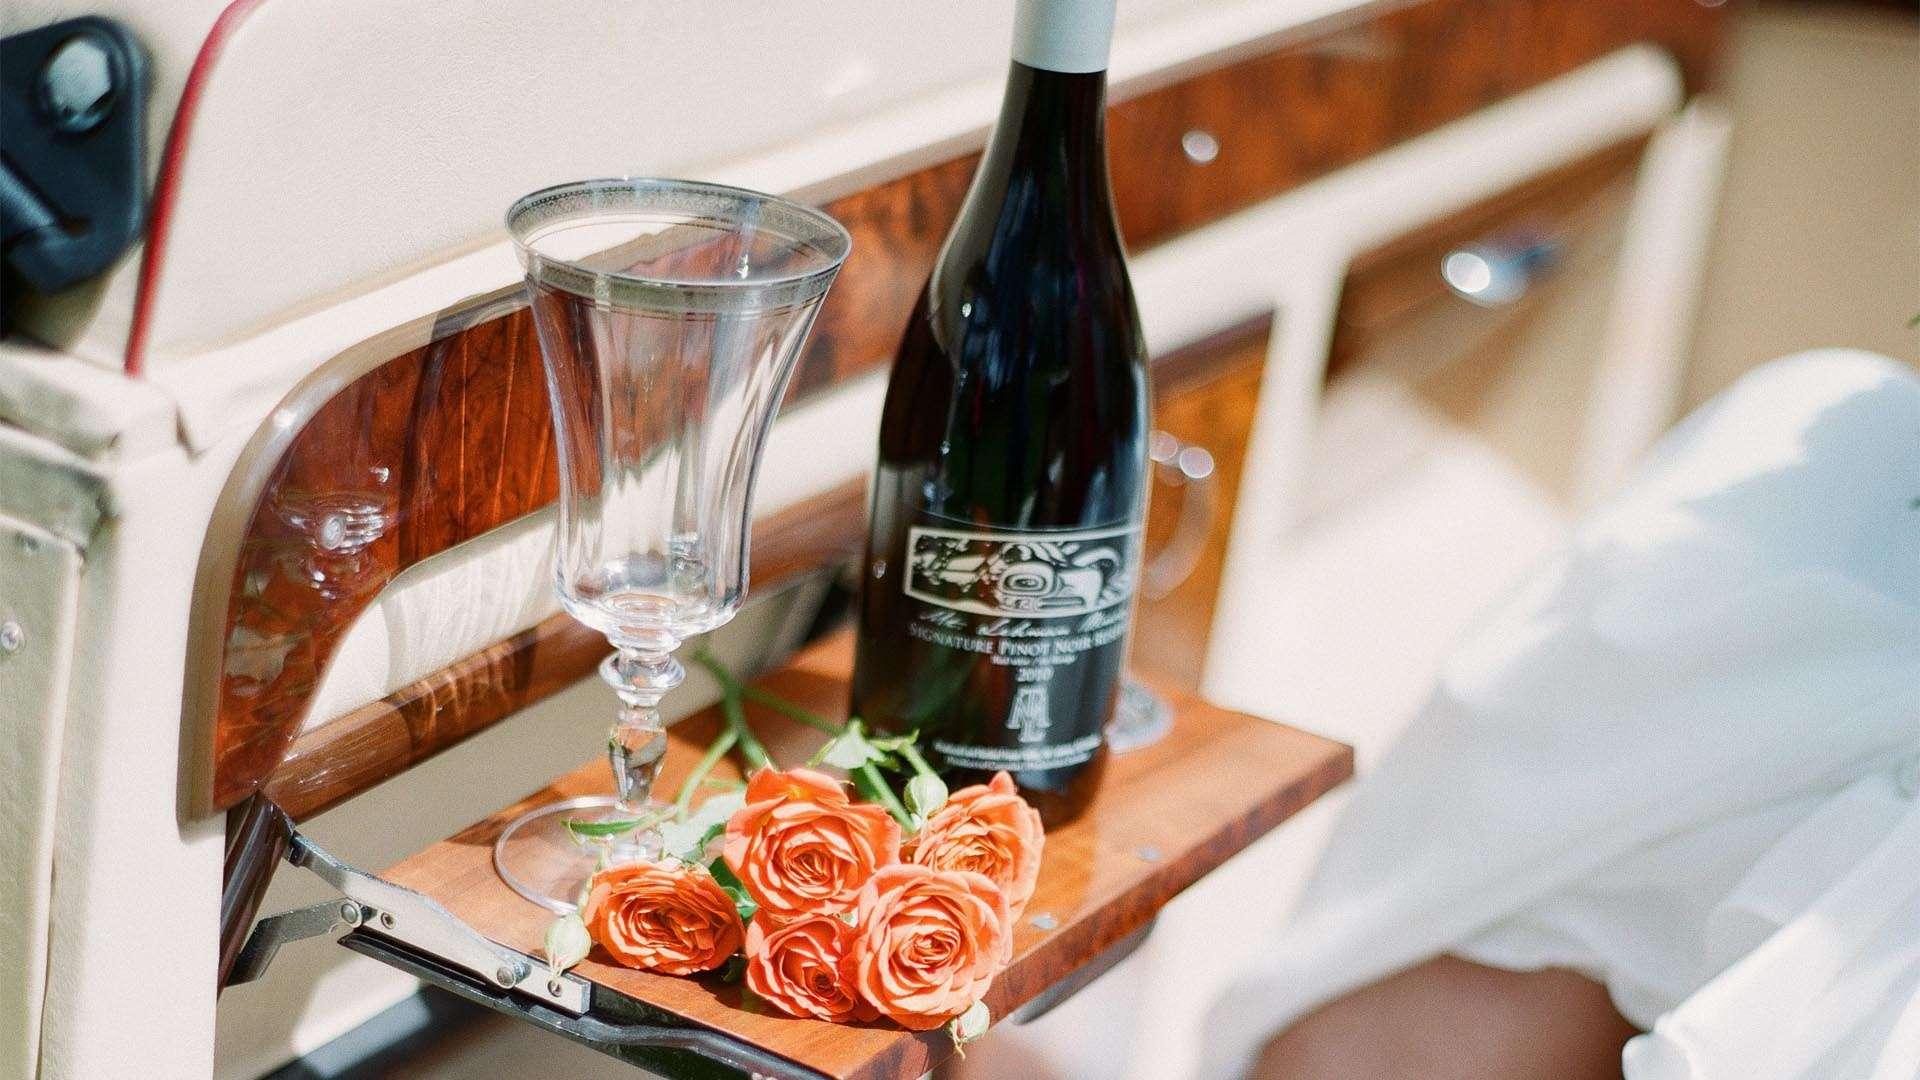 vancouver-wedding-rental-cars-special-occasions-Kirill-Bordon